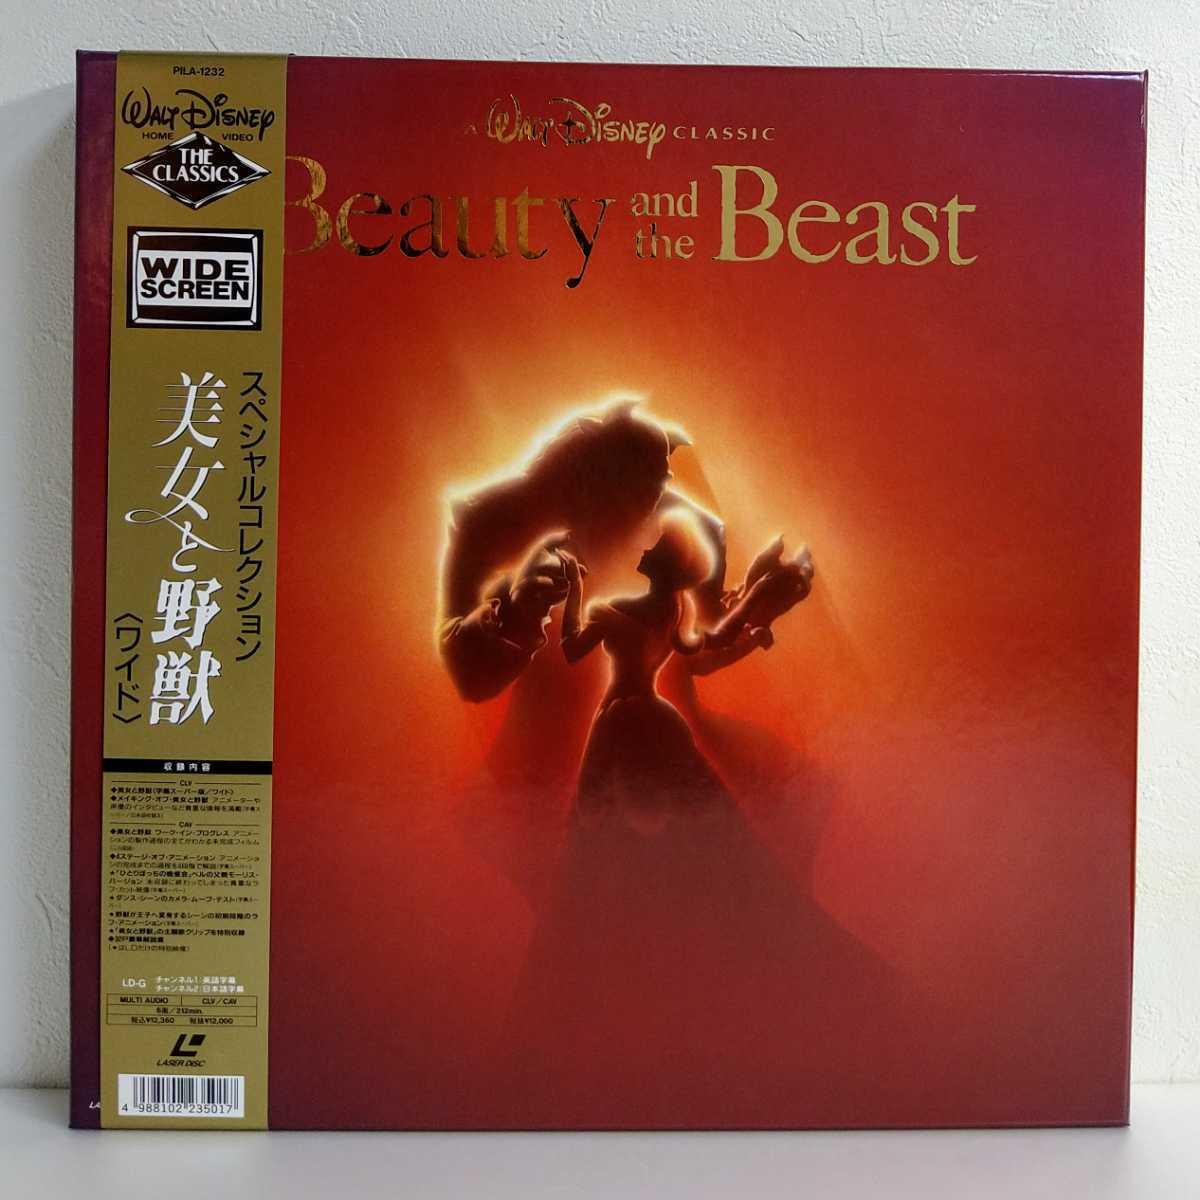 LD BOX 帯付 美品 スペシャルコレクション『美女と野獣』ワイド 3枚組 Walt Disney レーザーディスク